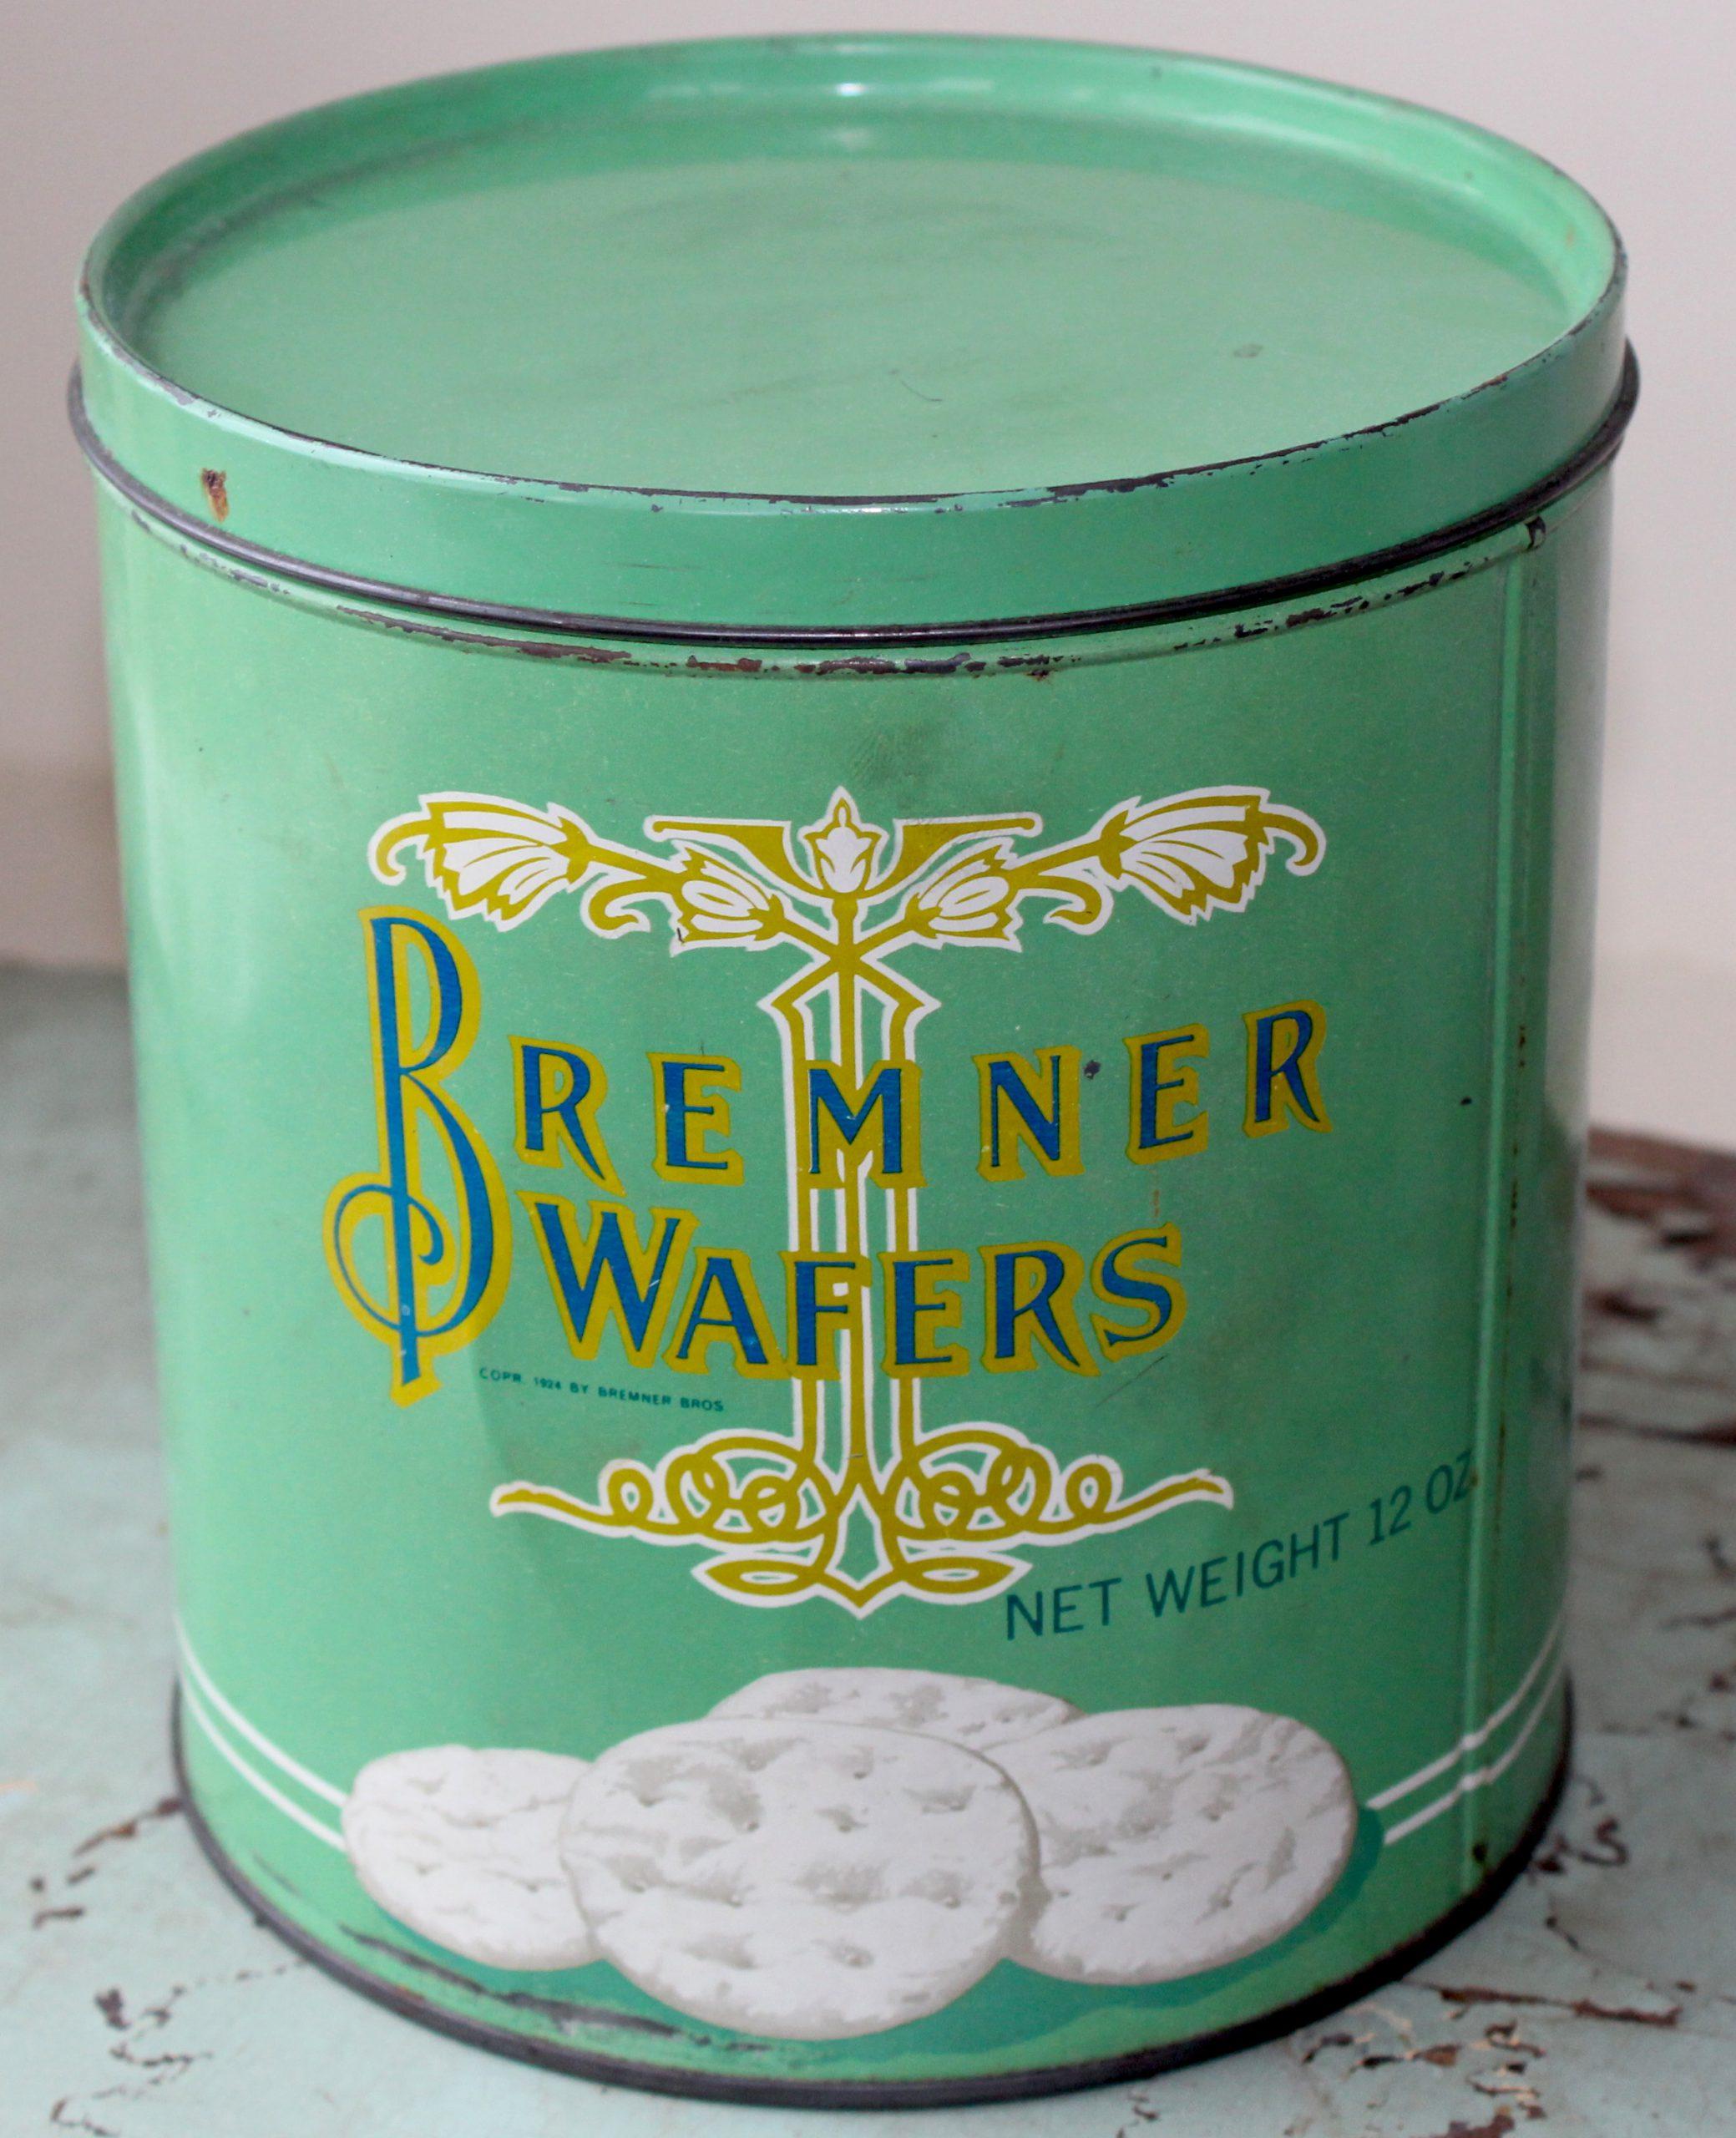 Bremner Biscuit Company History